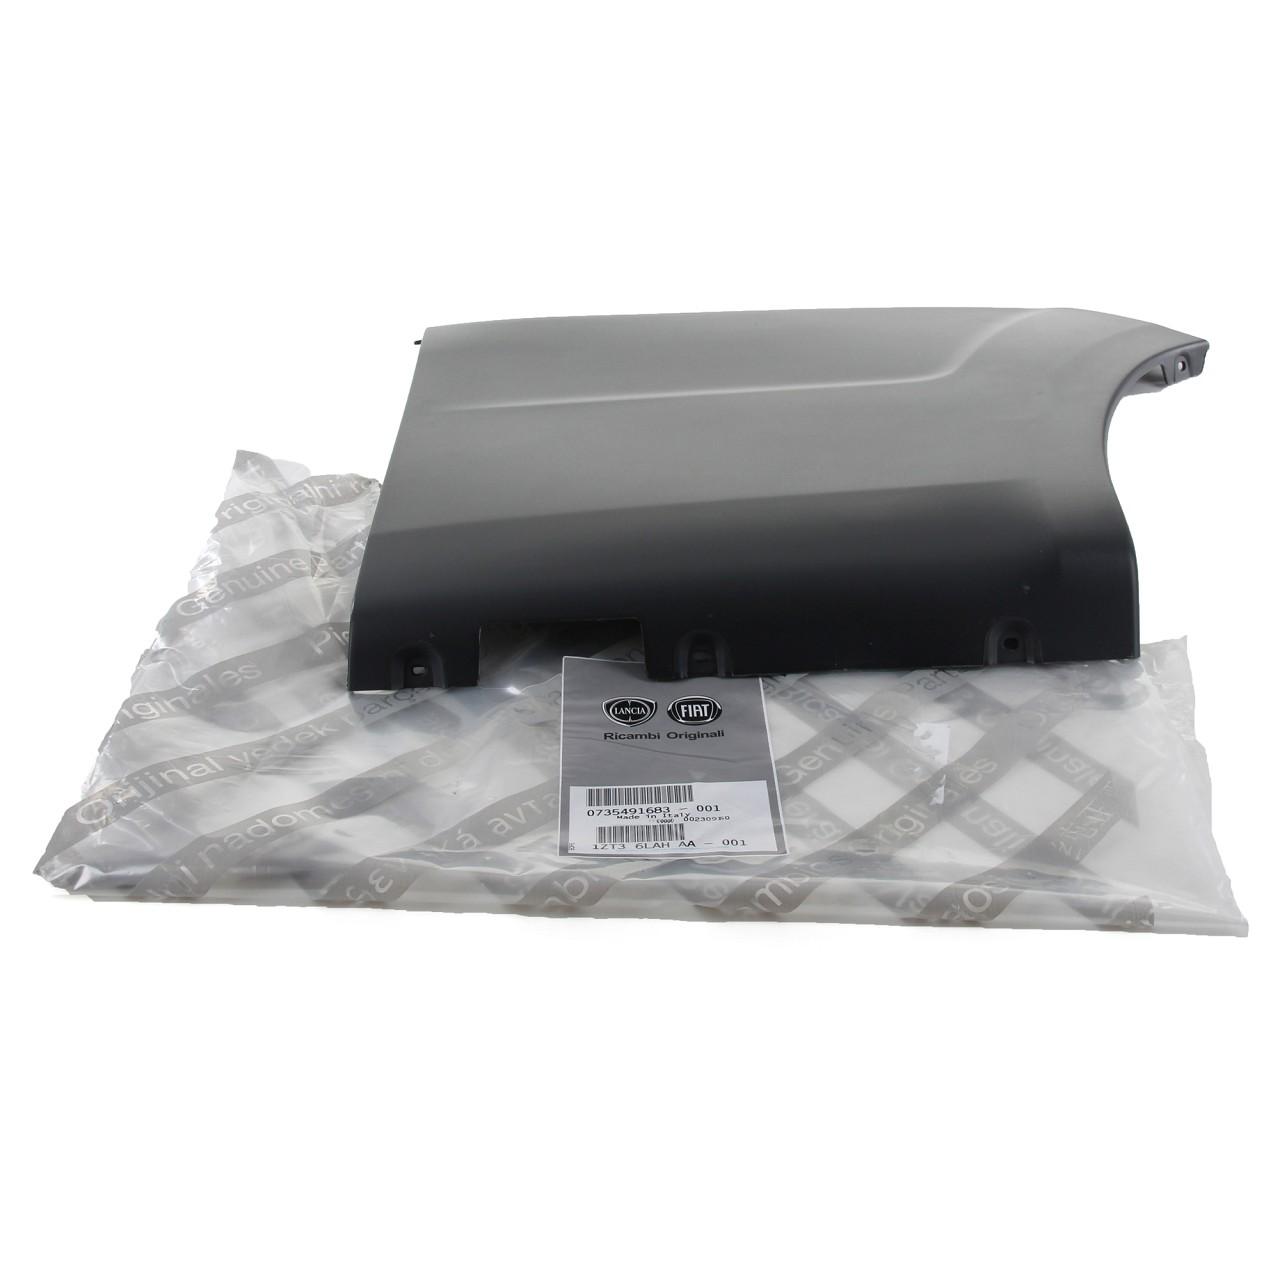 ORIGINAL Fiat Rammschutzleiste HINTEN RECHTS 735491683 für DUCATO (250_ 290_)